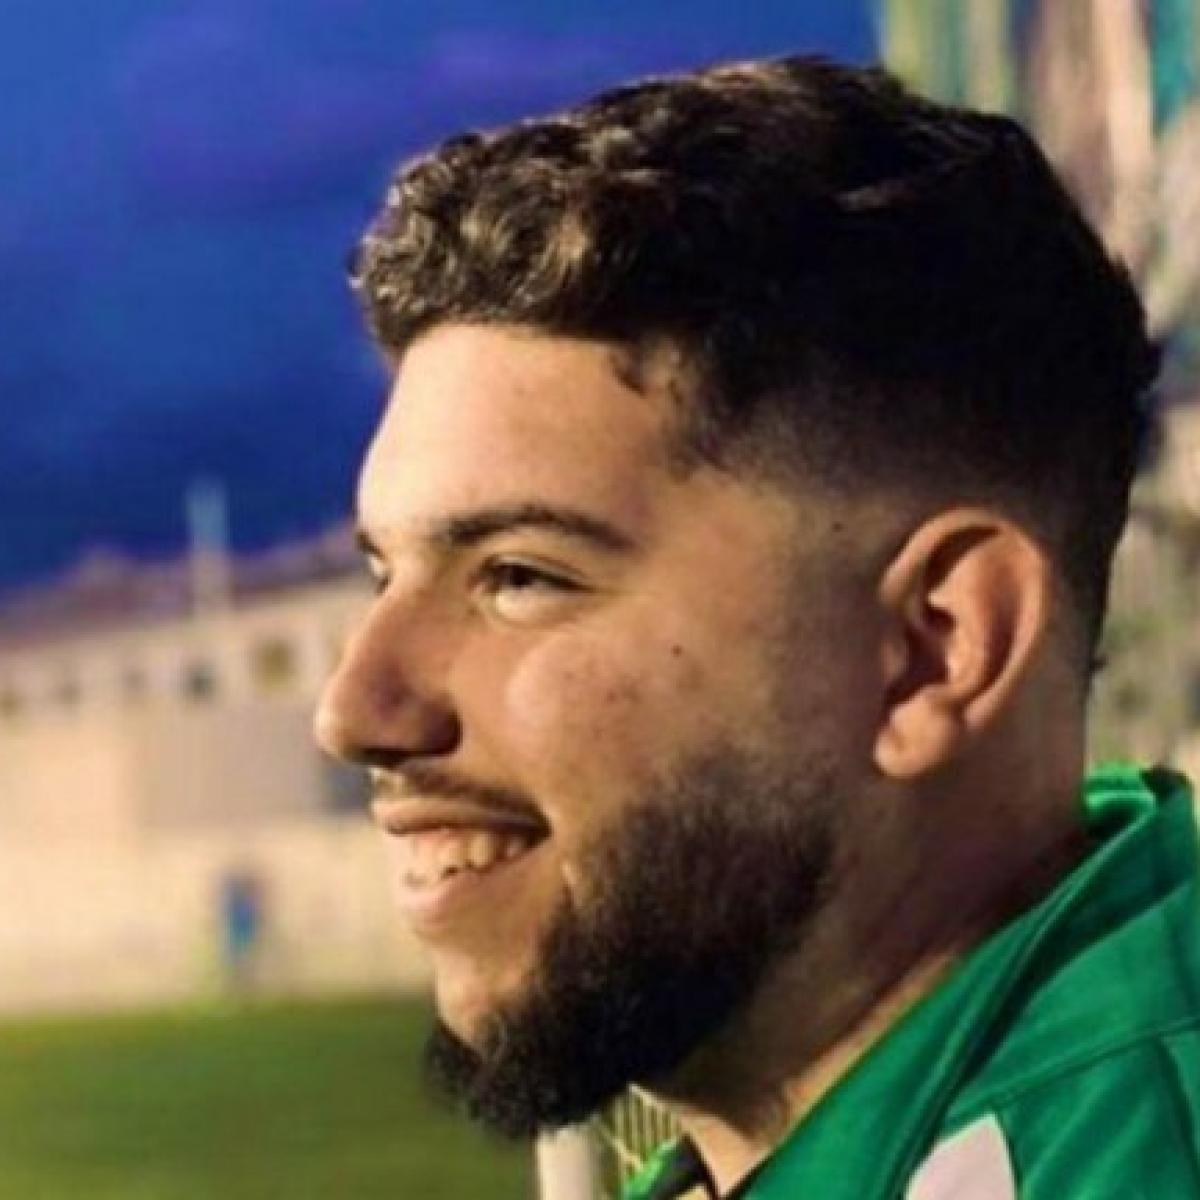 Spanish football coach aged 21 dies of coronavirus